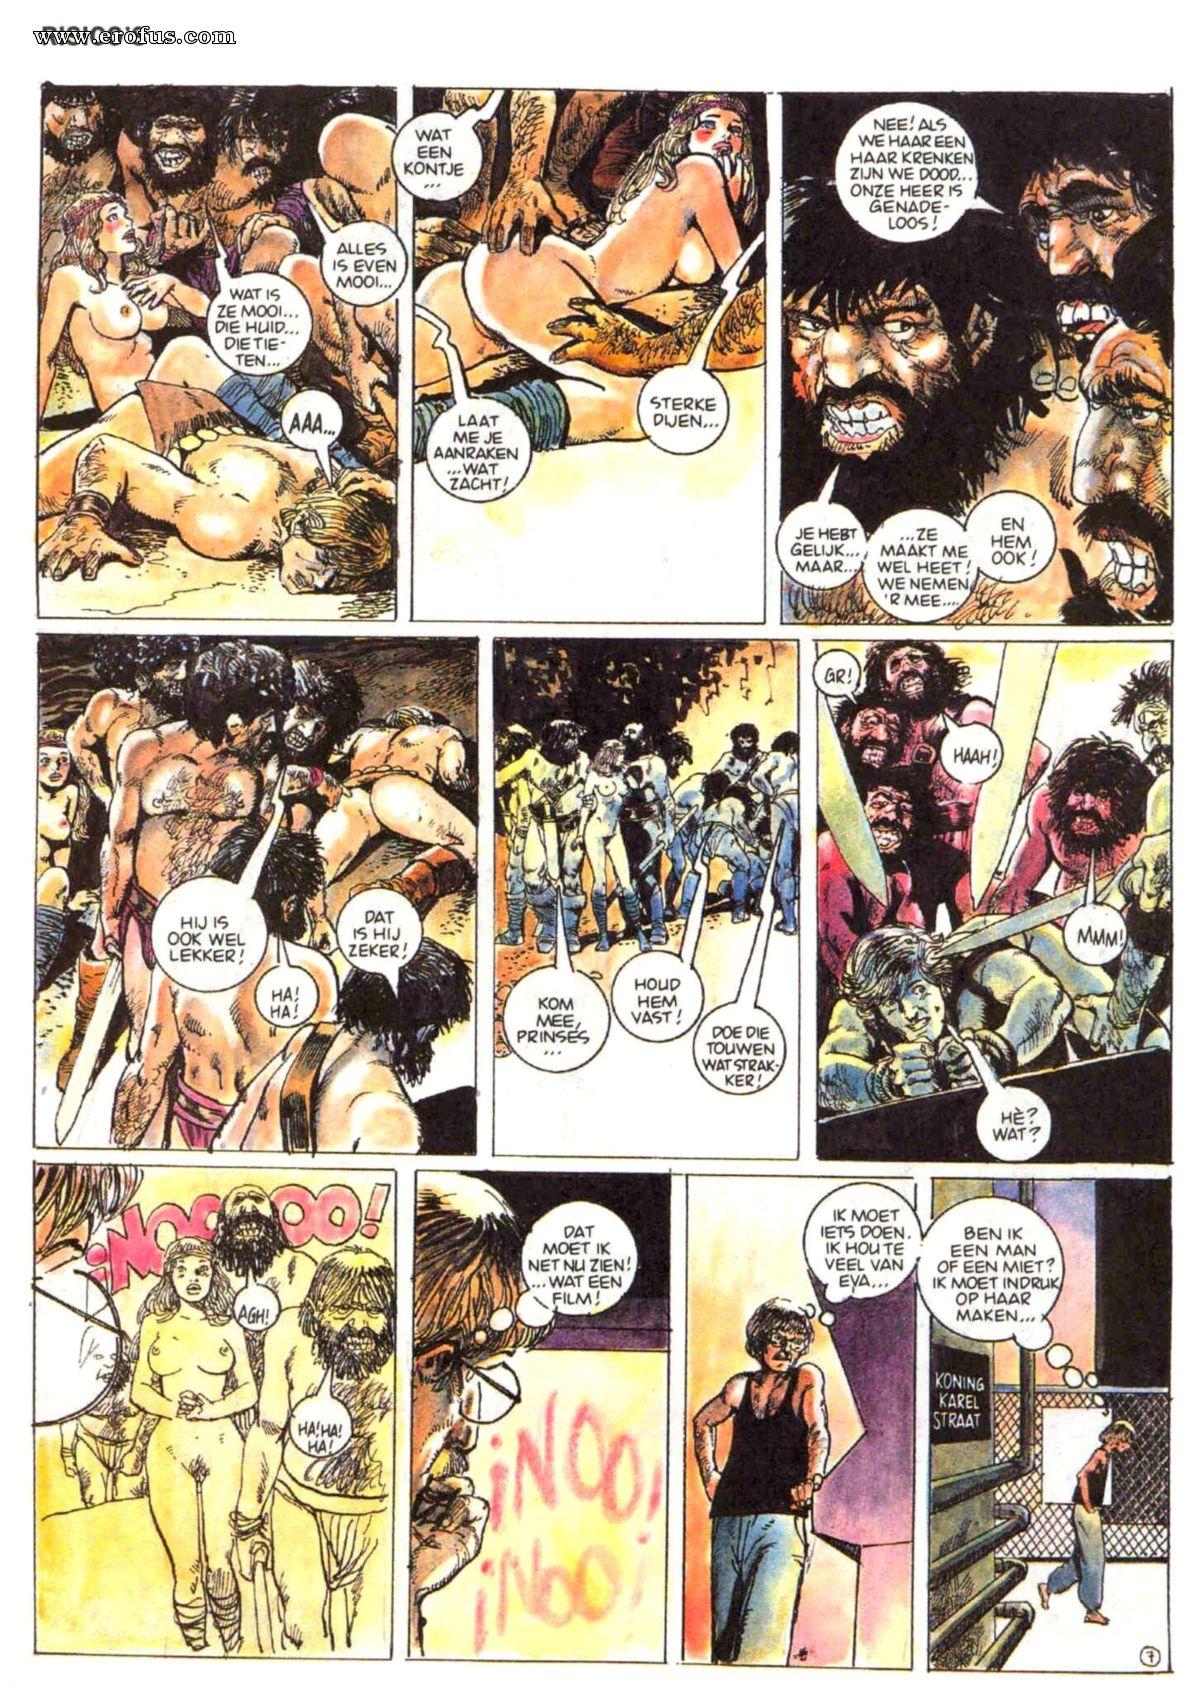 Deutsch porno comics Comics Porno